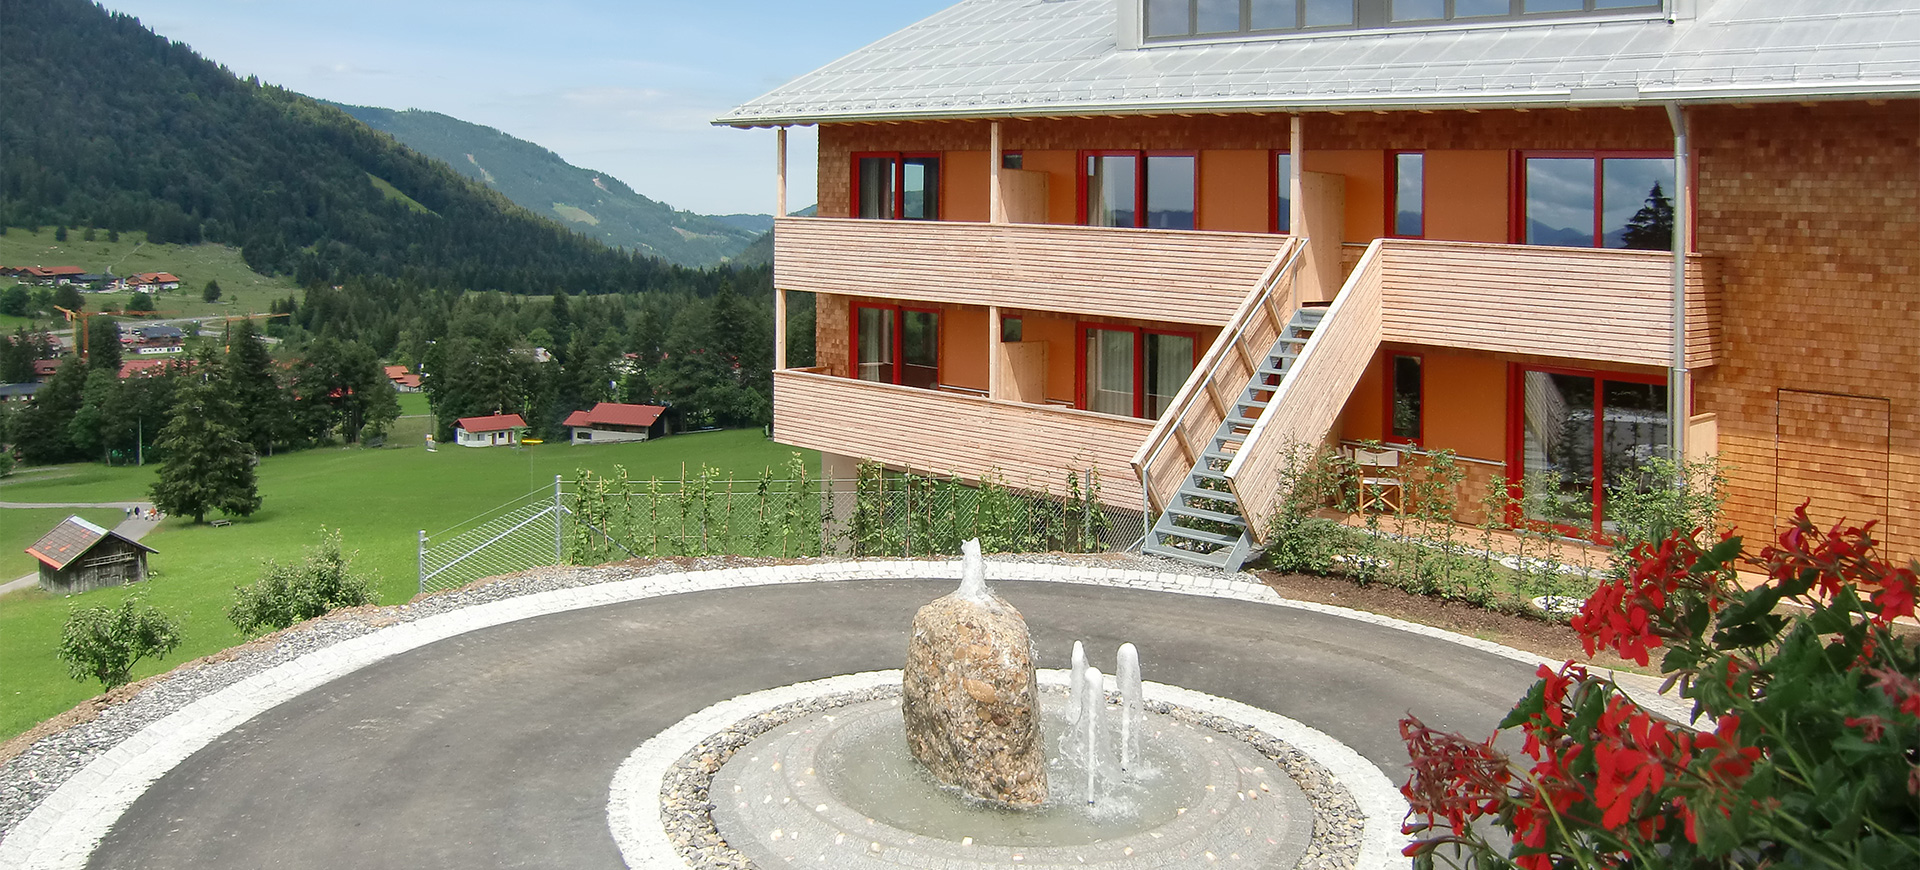 Bio Hotel Mattlihüs, Oberjoch